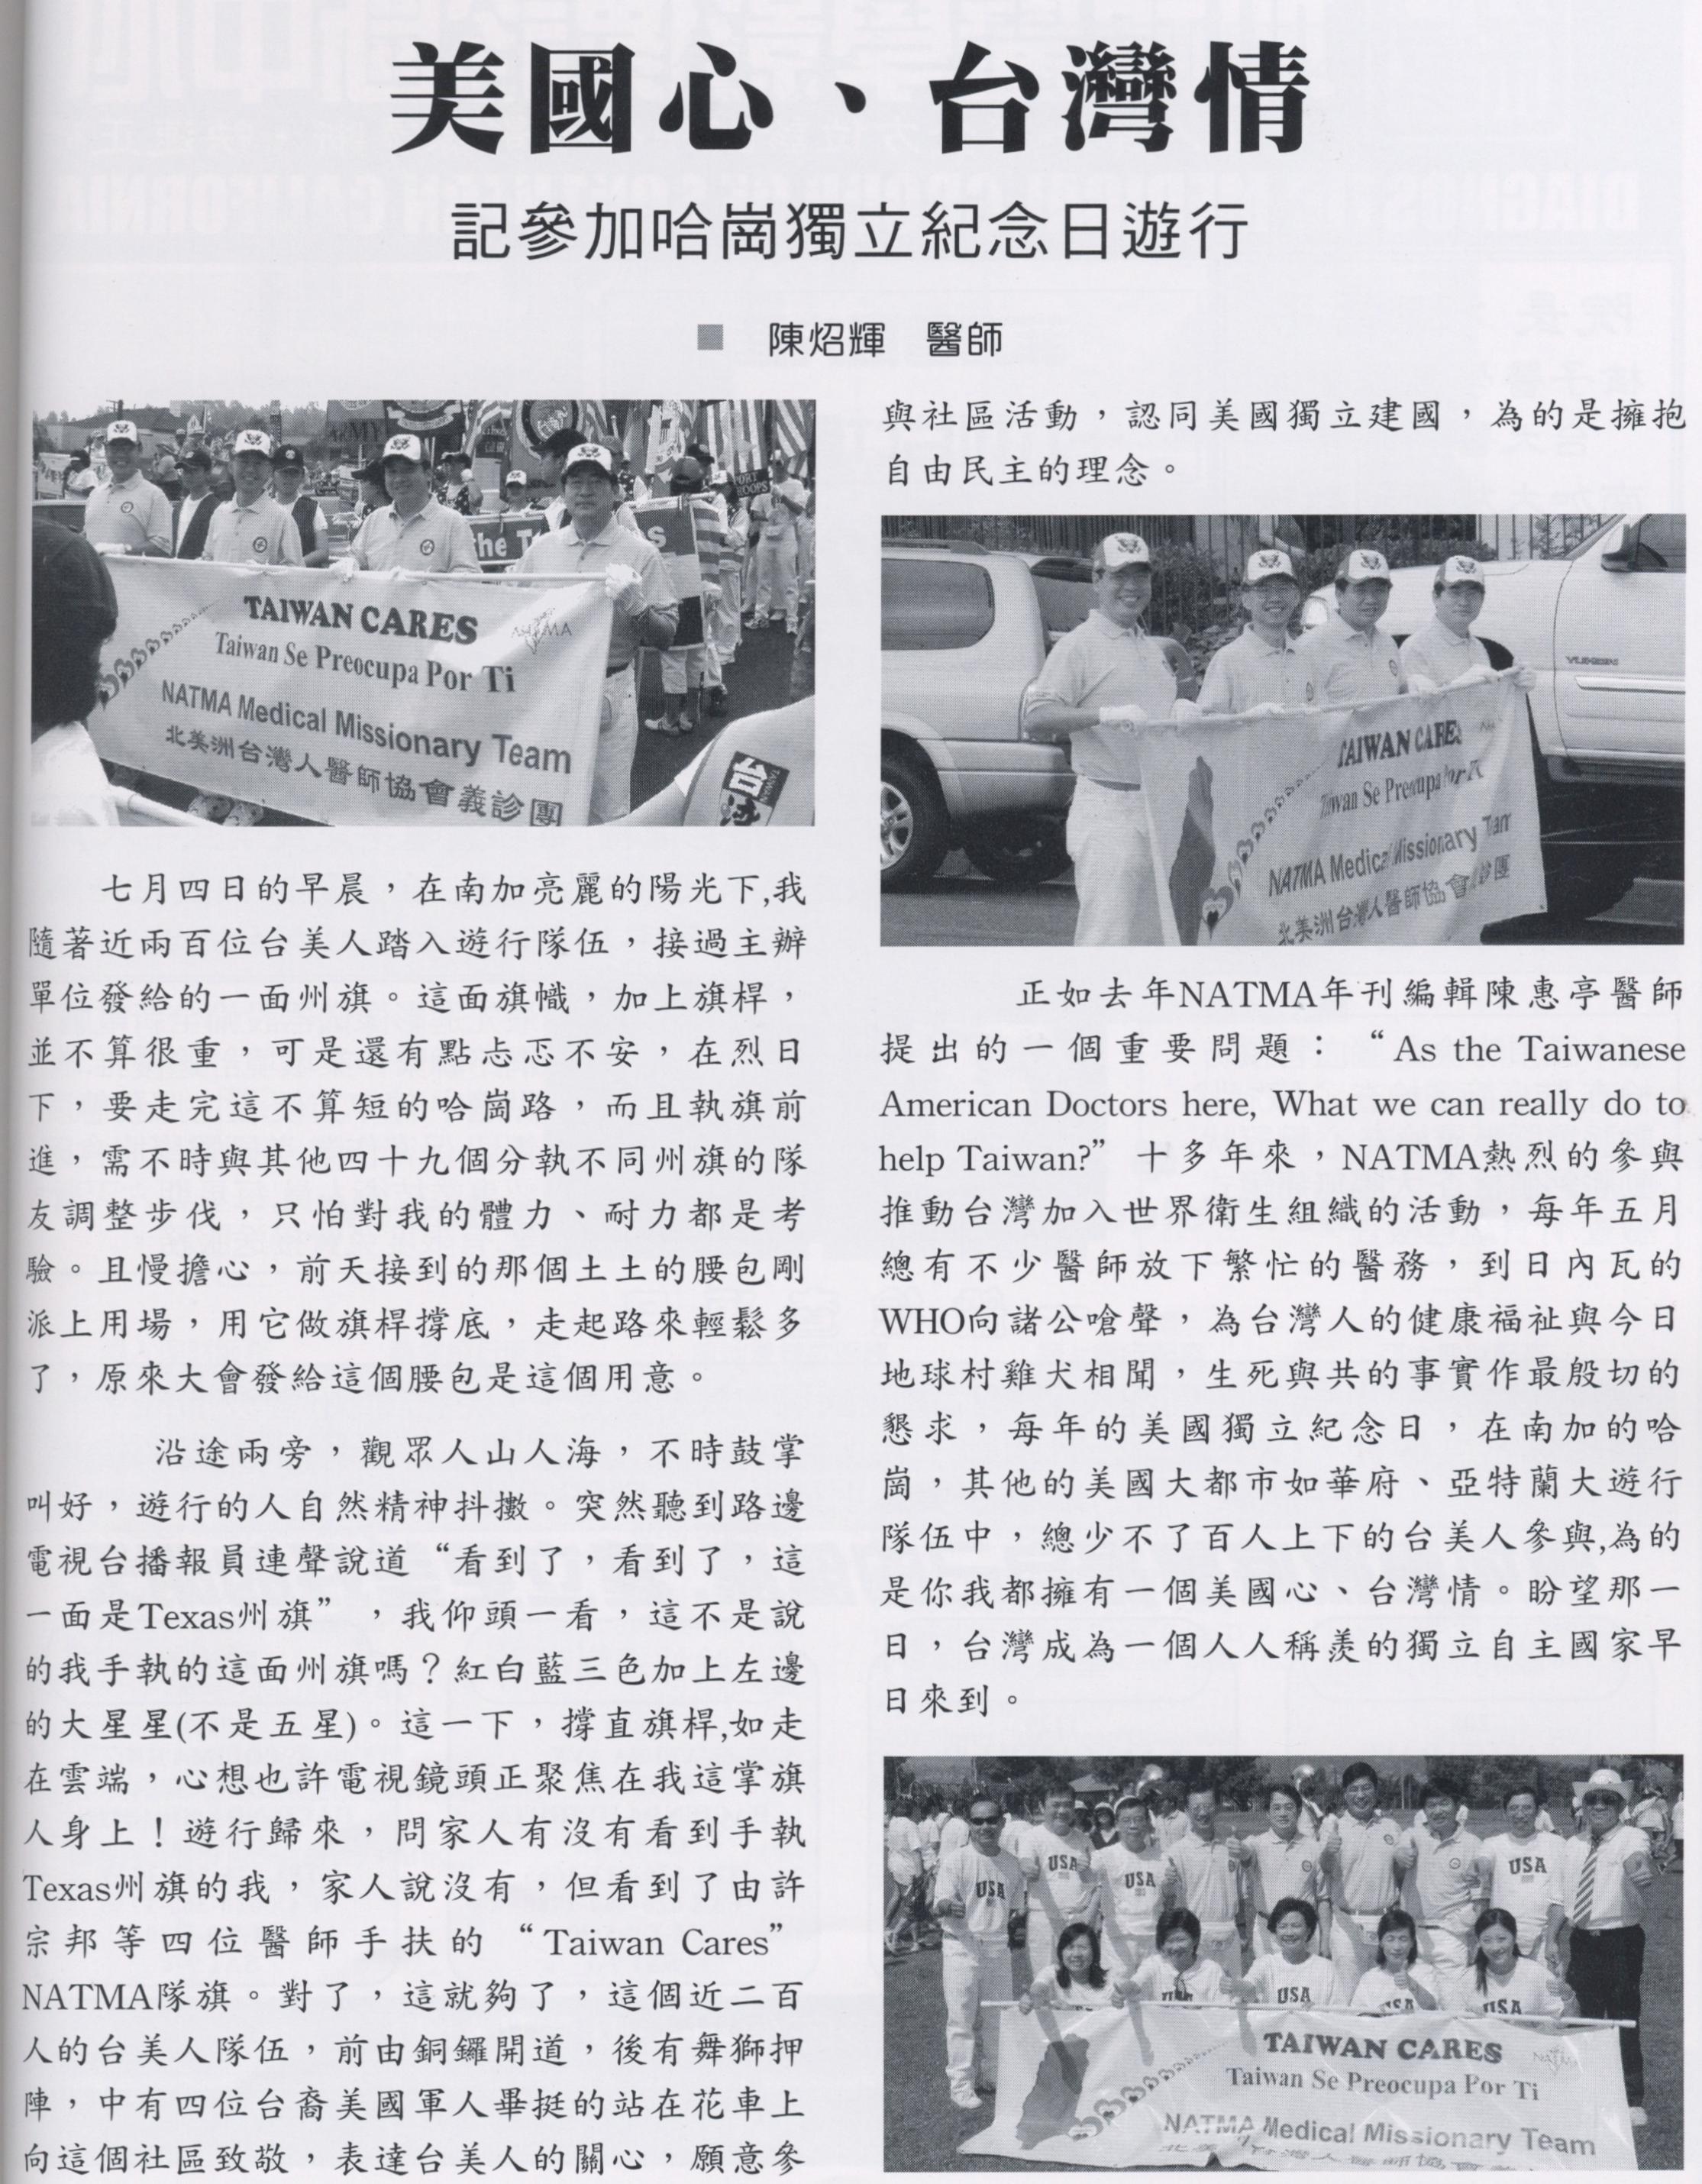 27. NATMA參加哈崗獨立紀念日遊行-2005/07/04